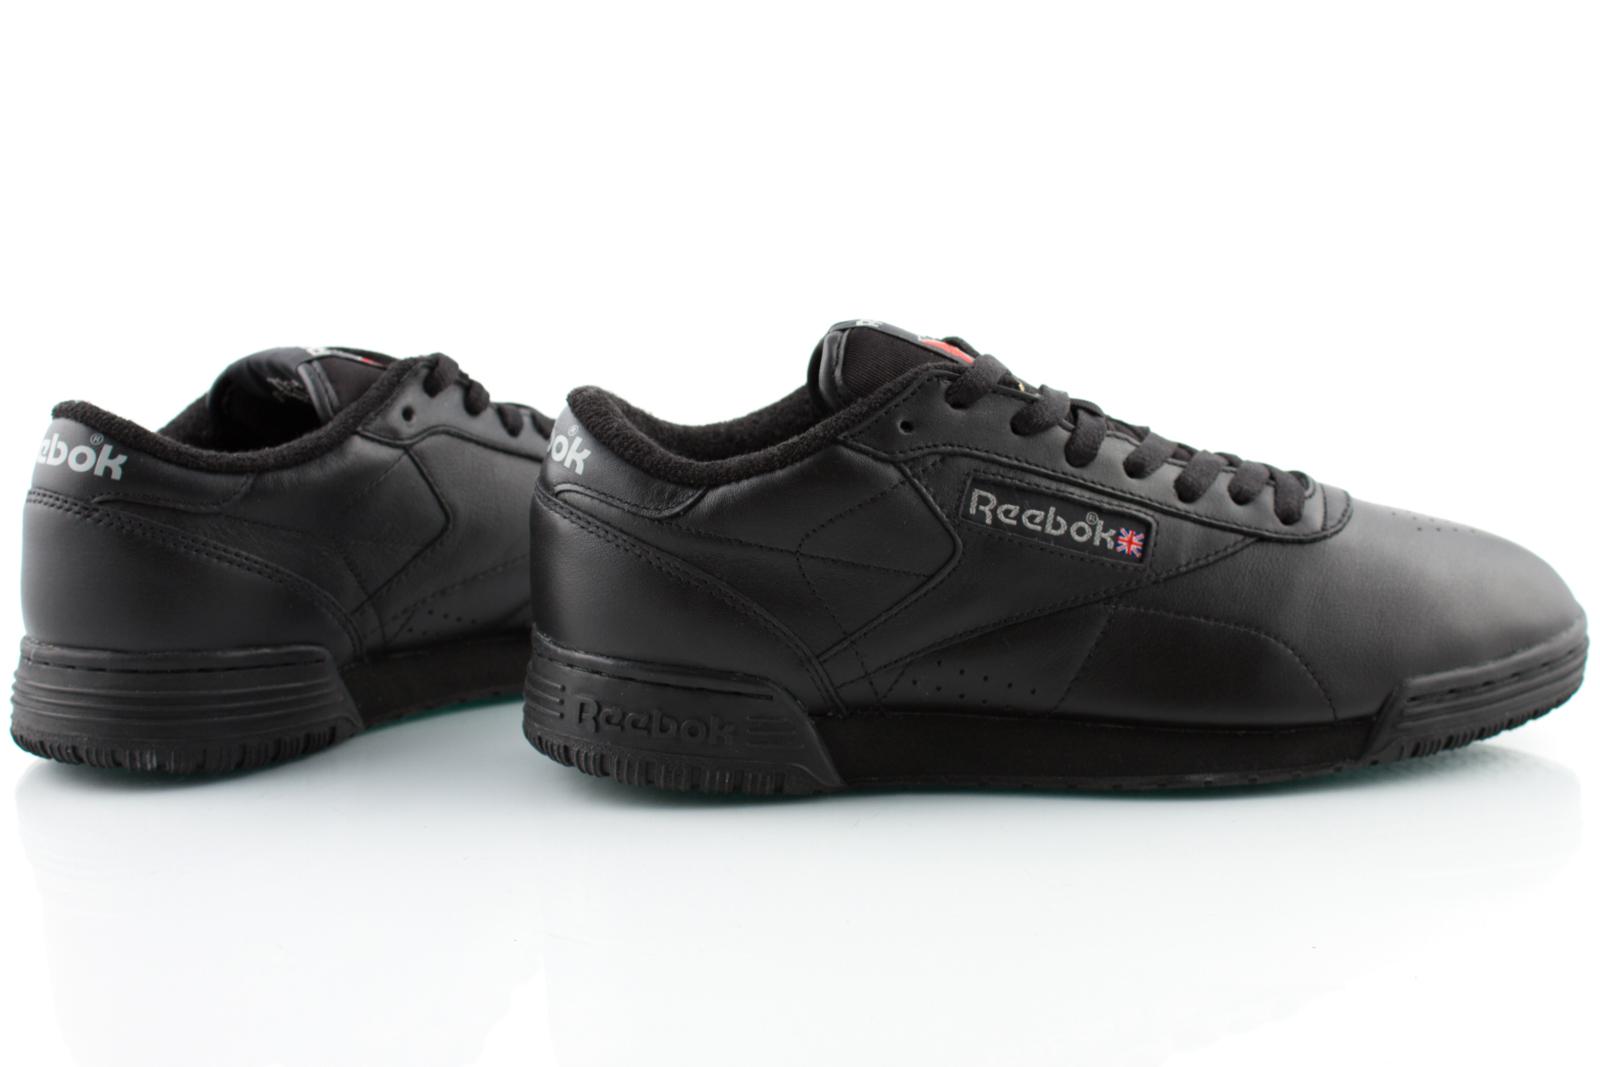 REEBOK Buty męskie sneakersy Classic Leather 41 7256802326